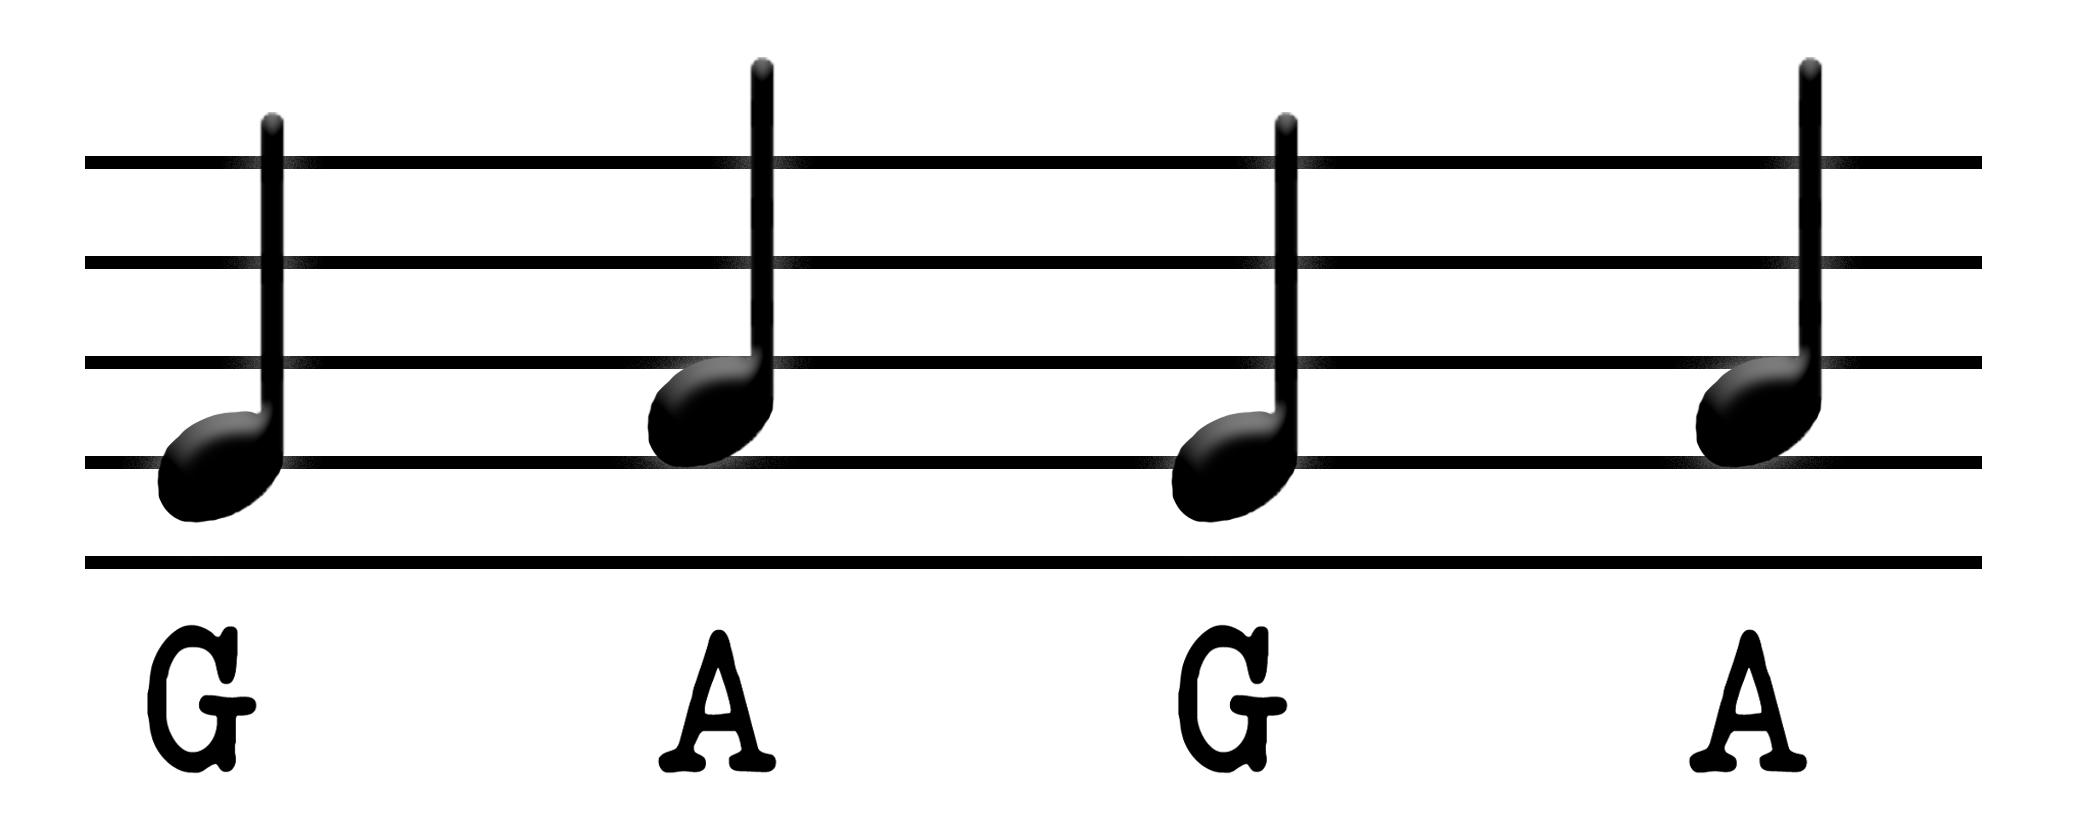 Bezel-Gaga-Album.png